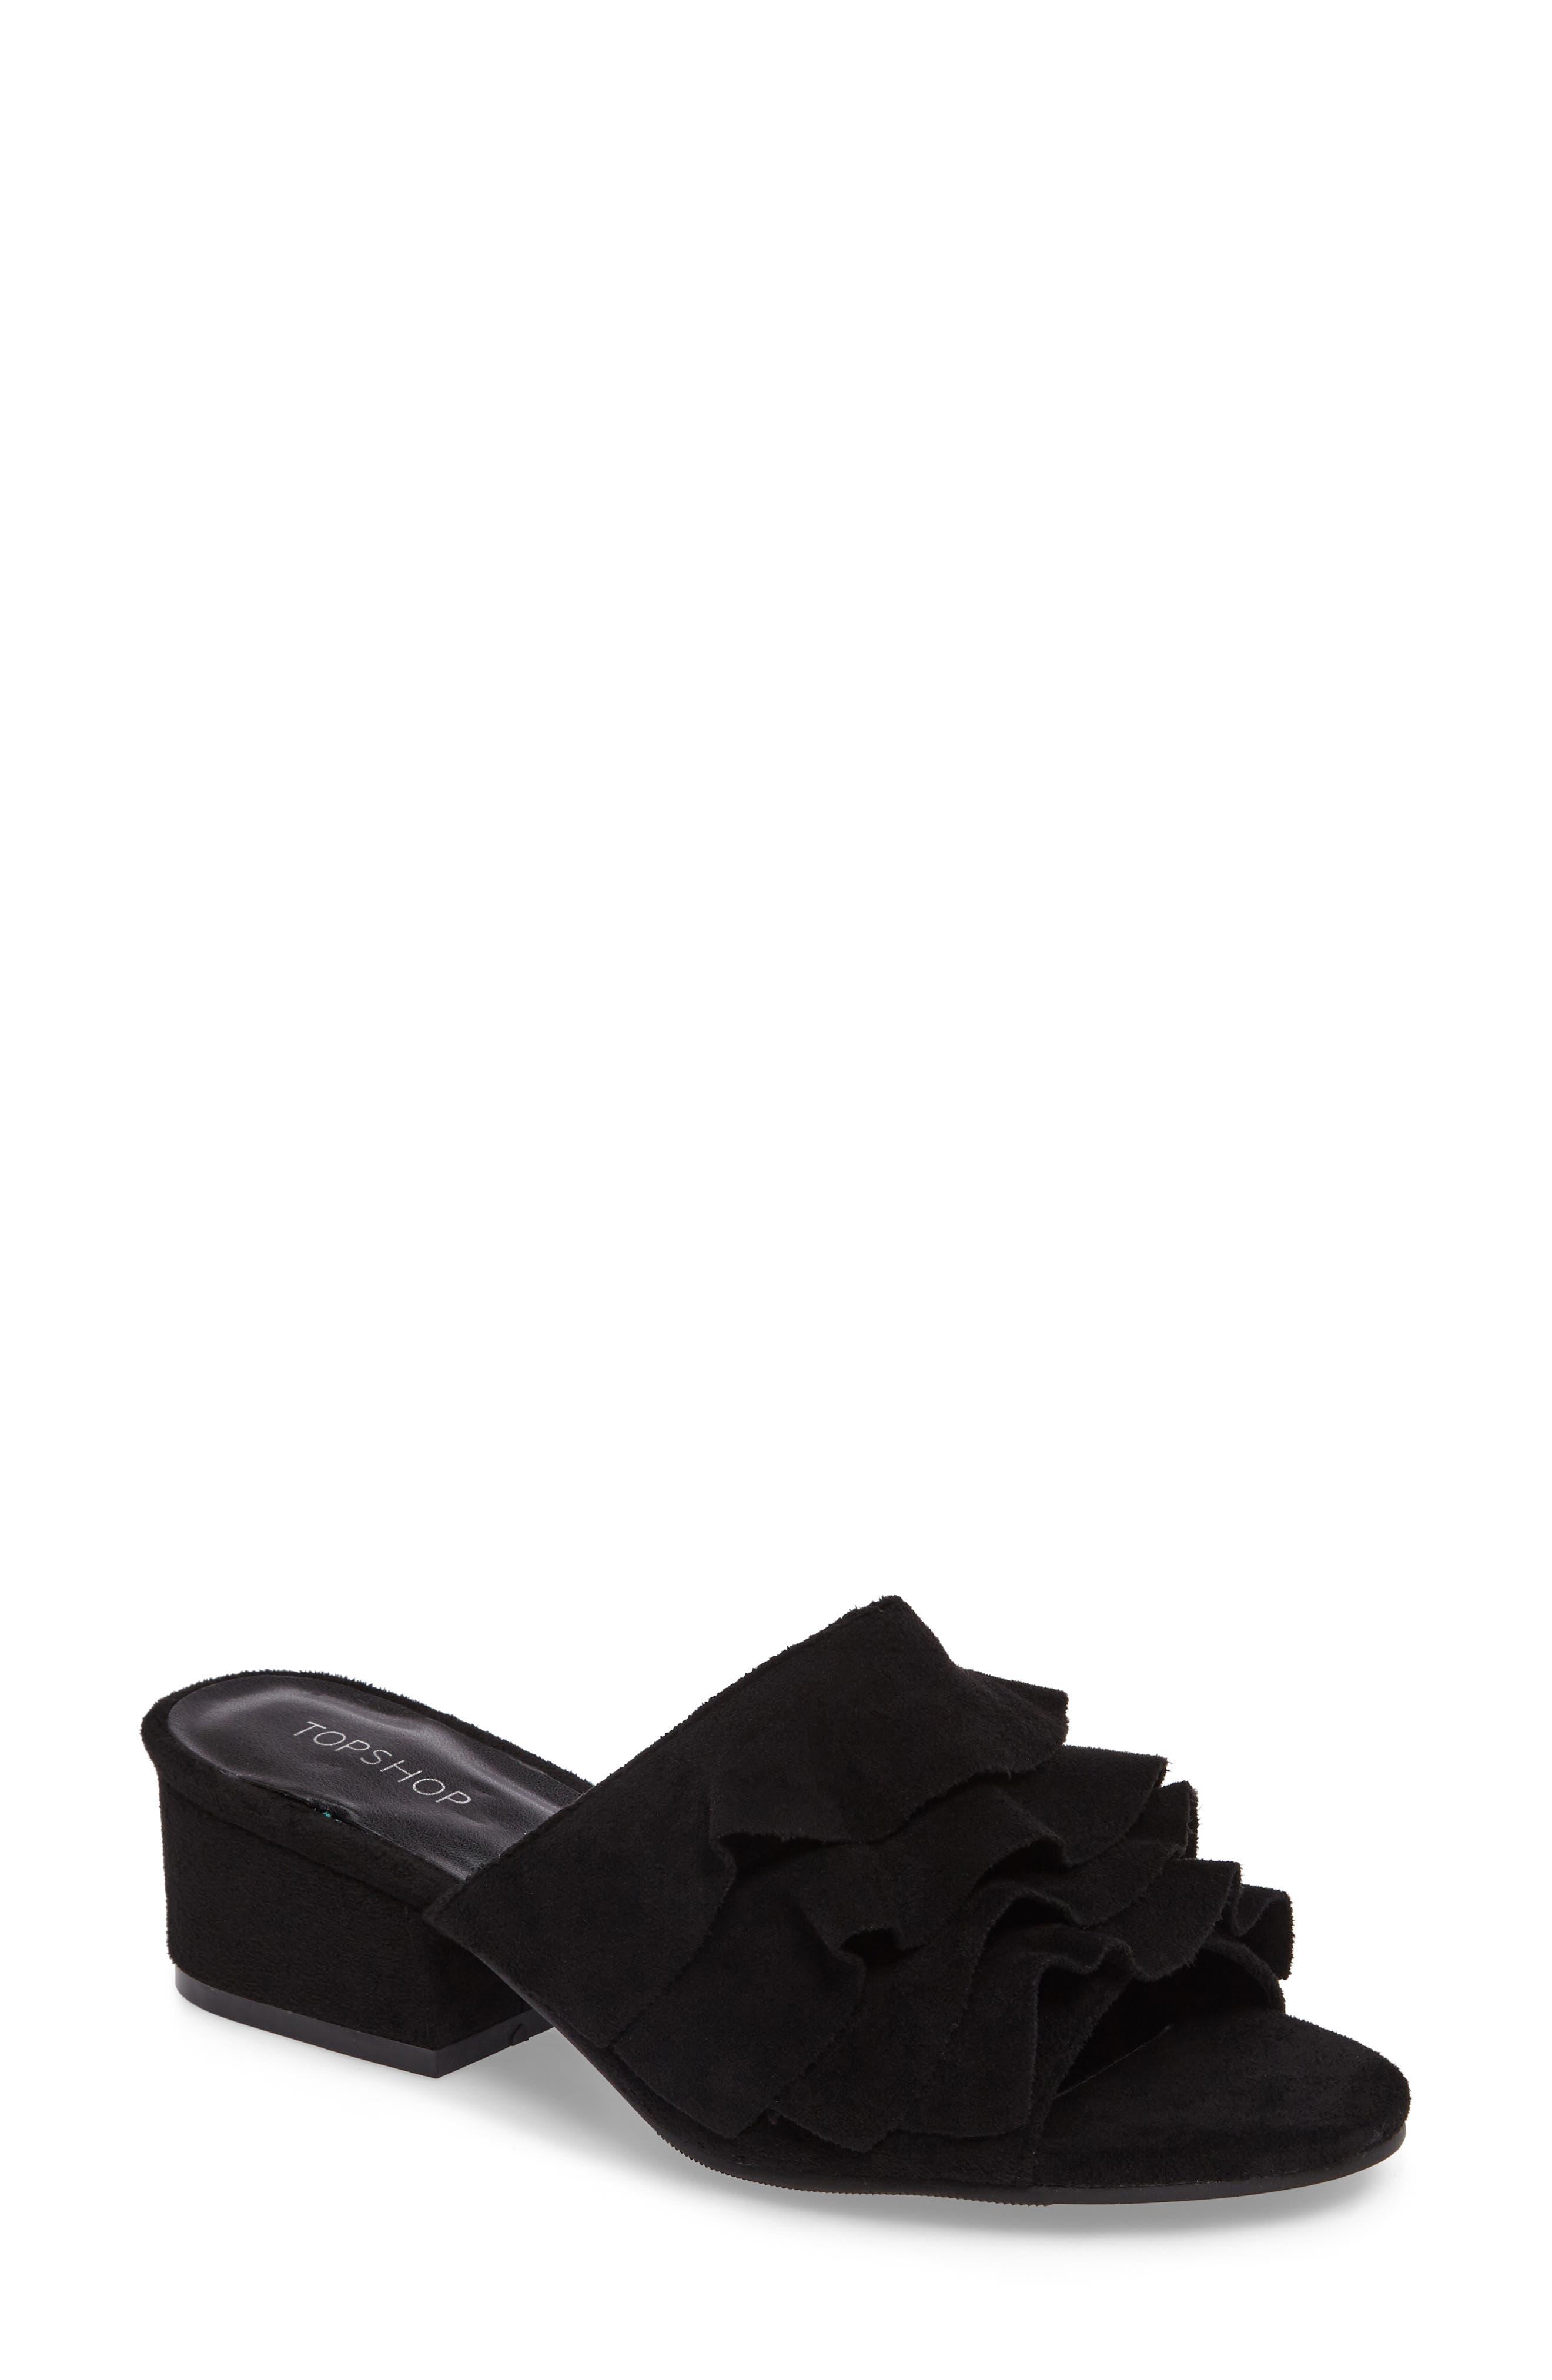 Main Image - Topshop Darcy Ruffle Slide Sandal (Women)